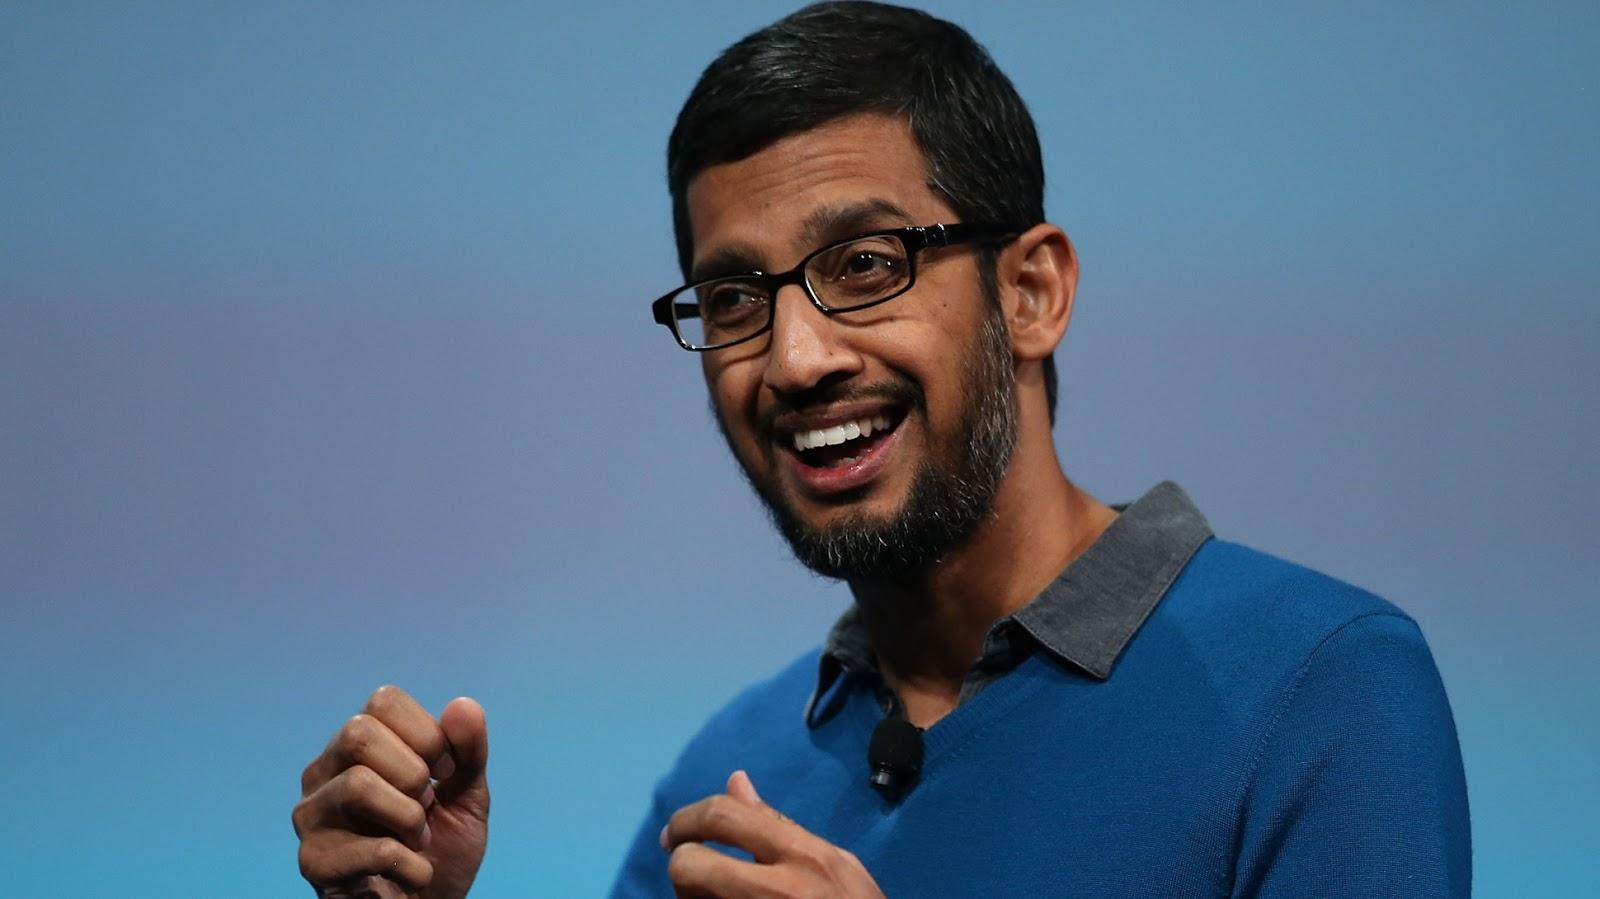 Kisah Inspiratif Dari Sundar Pichai (CEO Google)